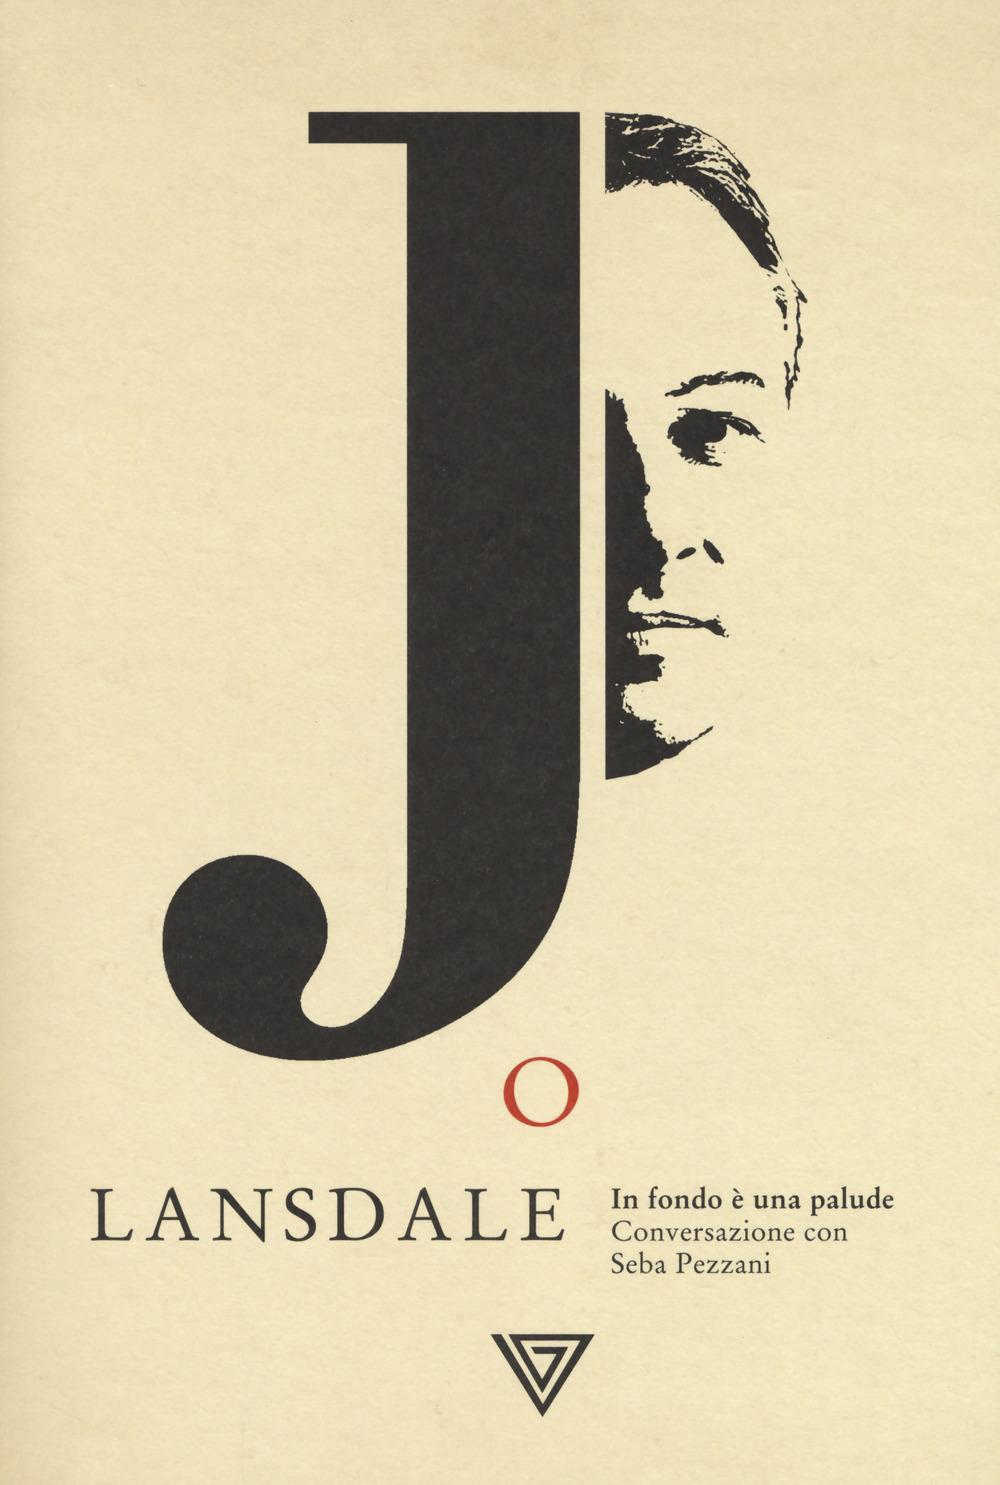 Joe Lansdale. In fondo è una palude